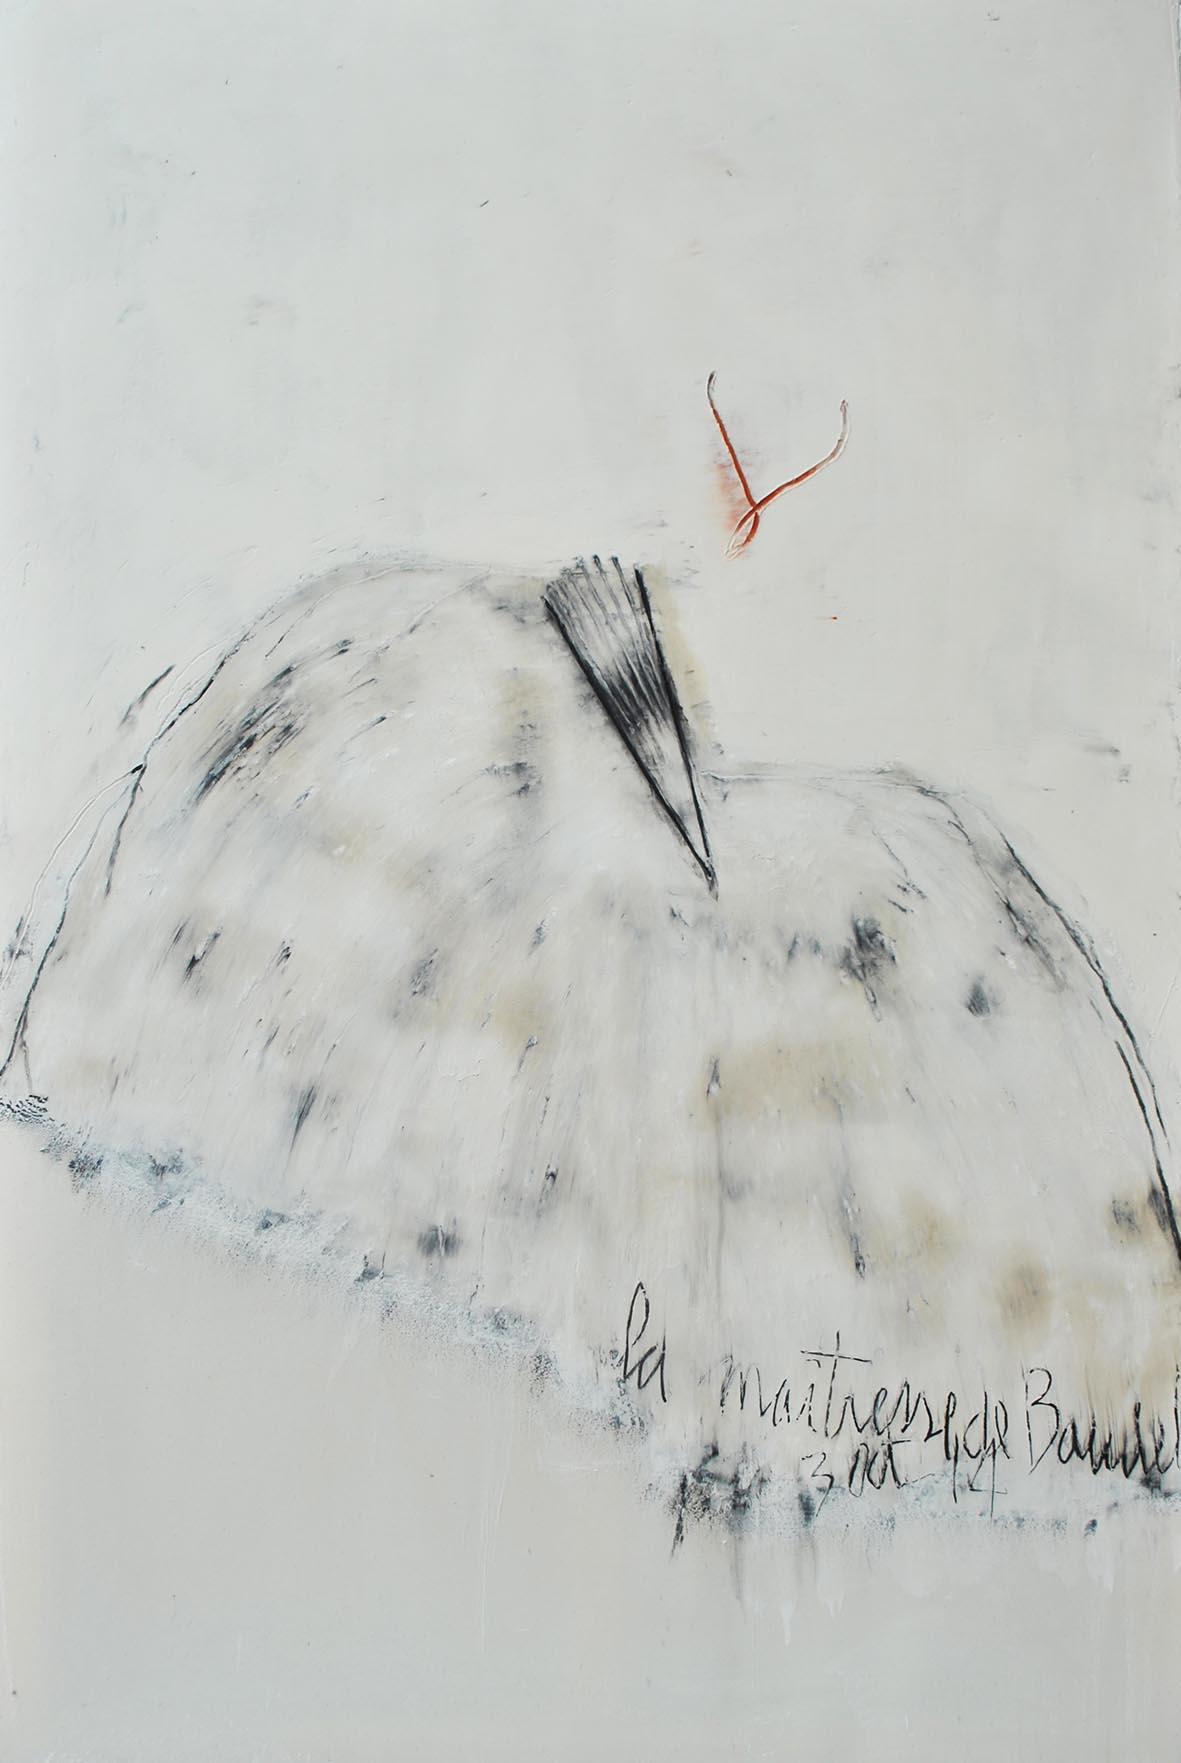 Jean-pierre Schneider - La maîtresse de Baudelaire